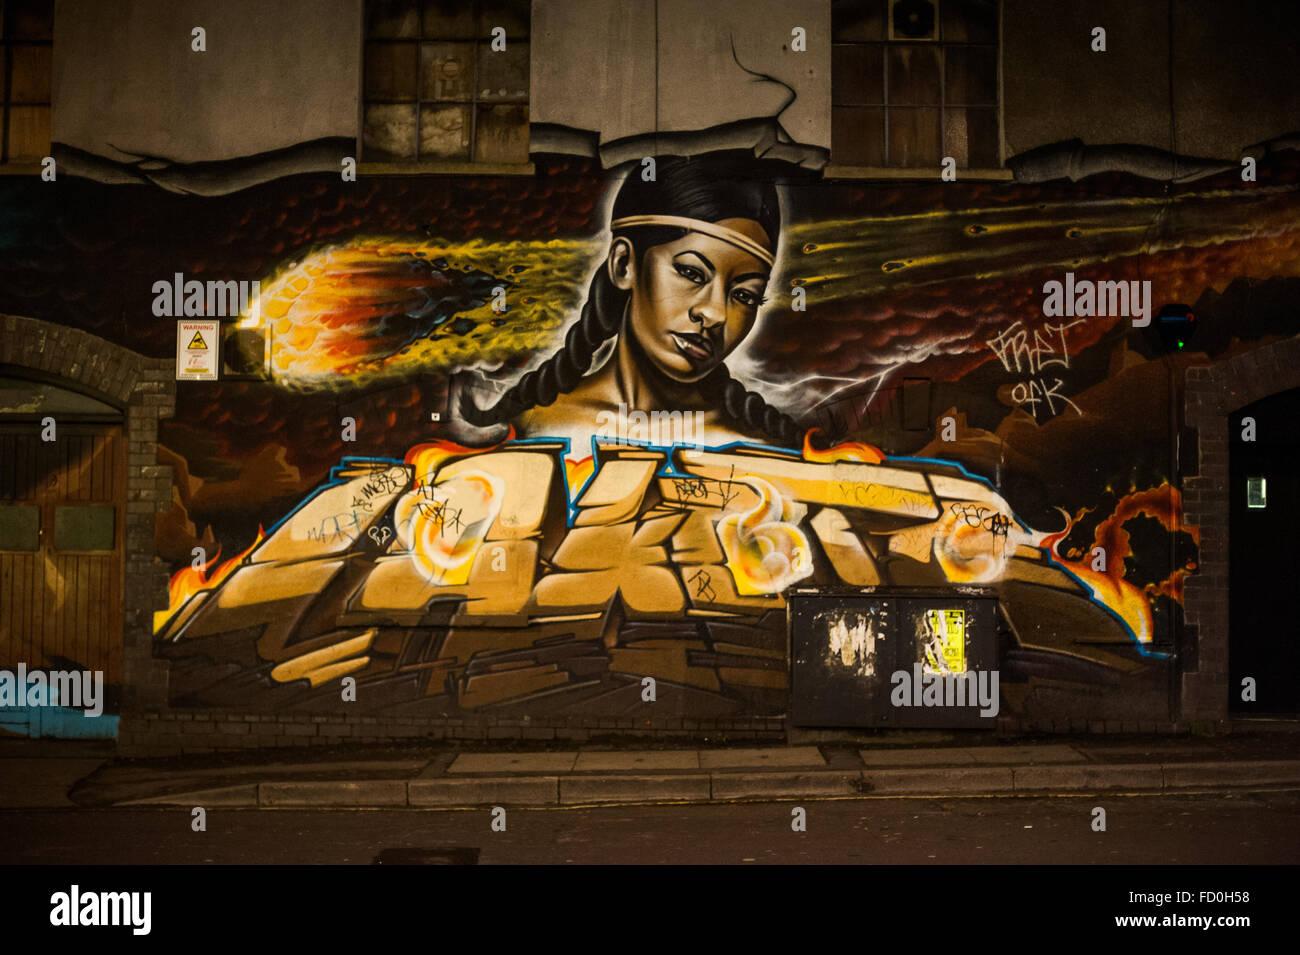 Urban street art at night in Stokes Croft, Bristol, England - Stock Image